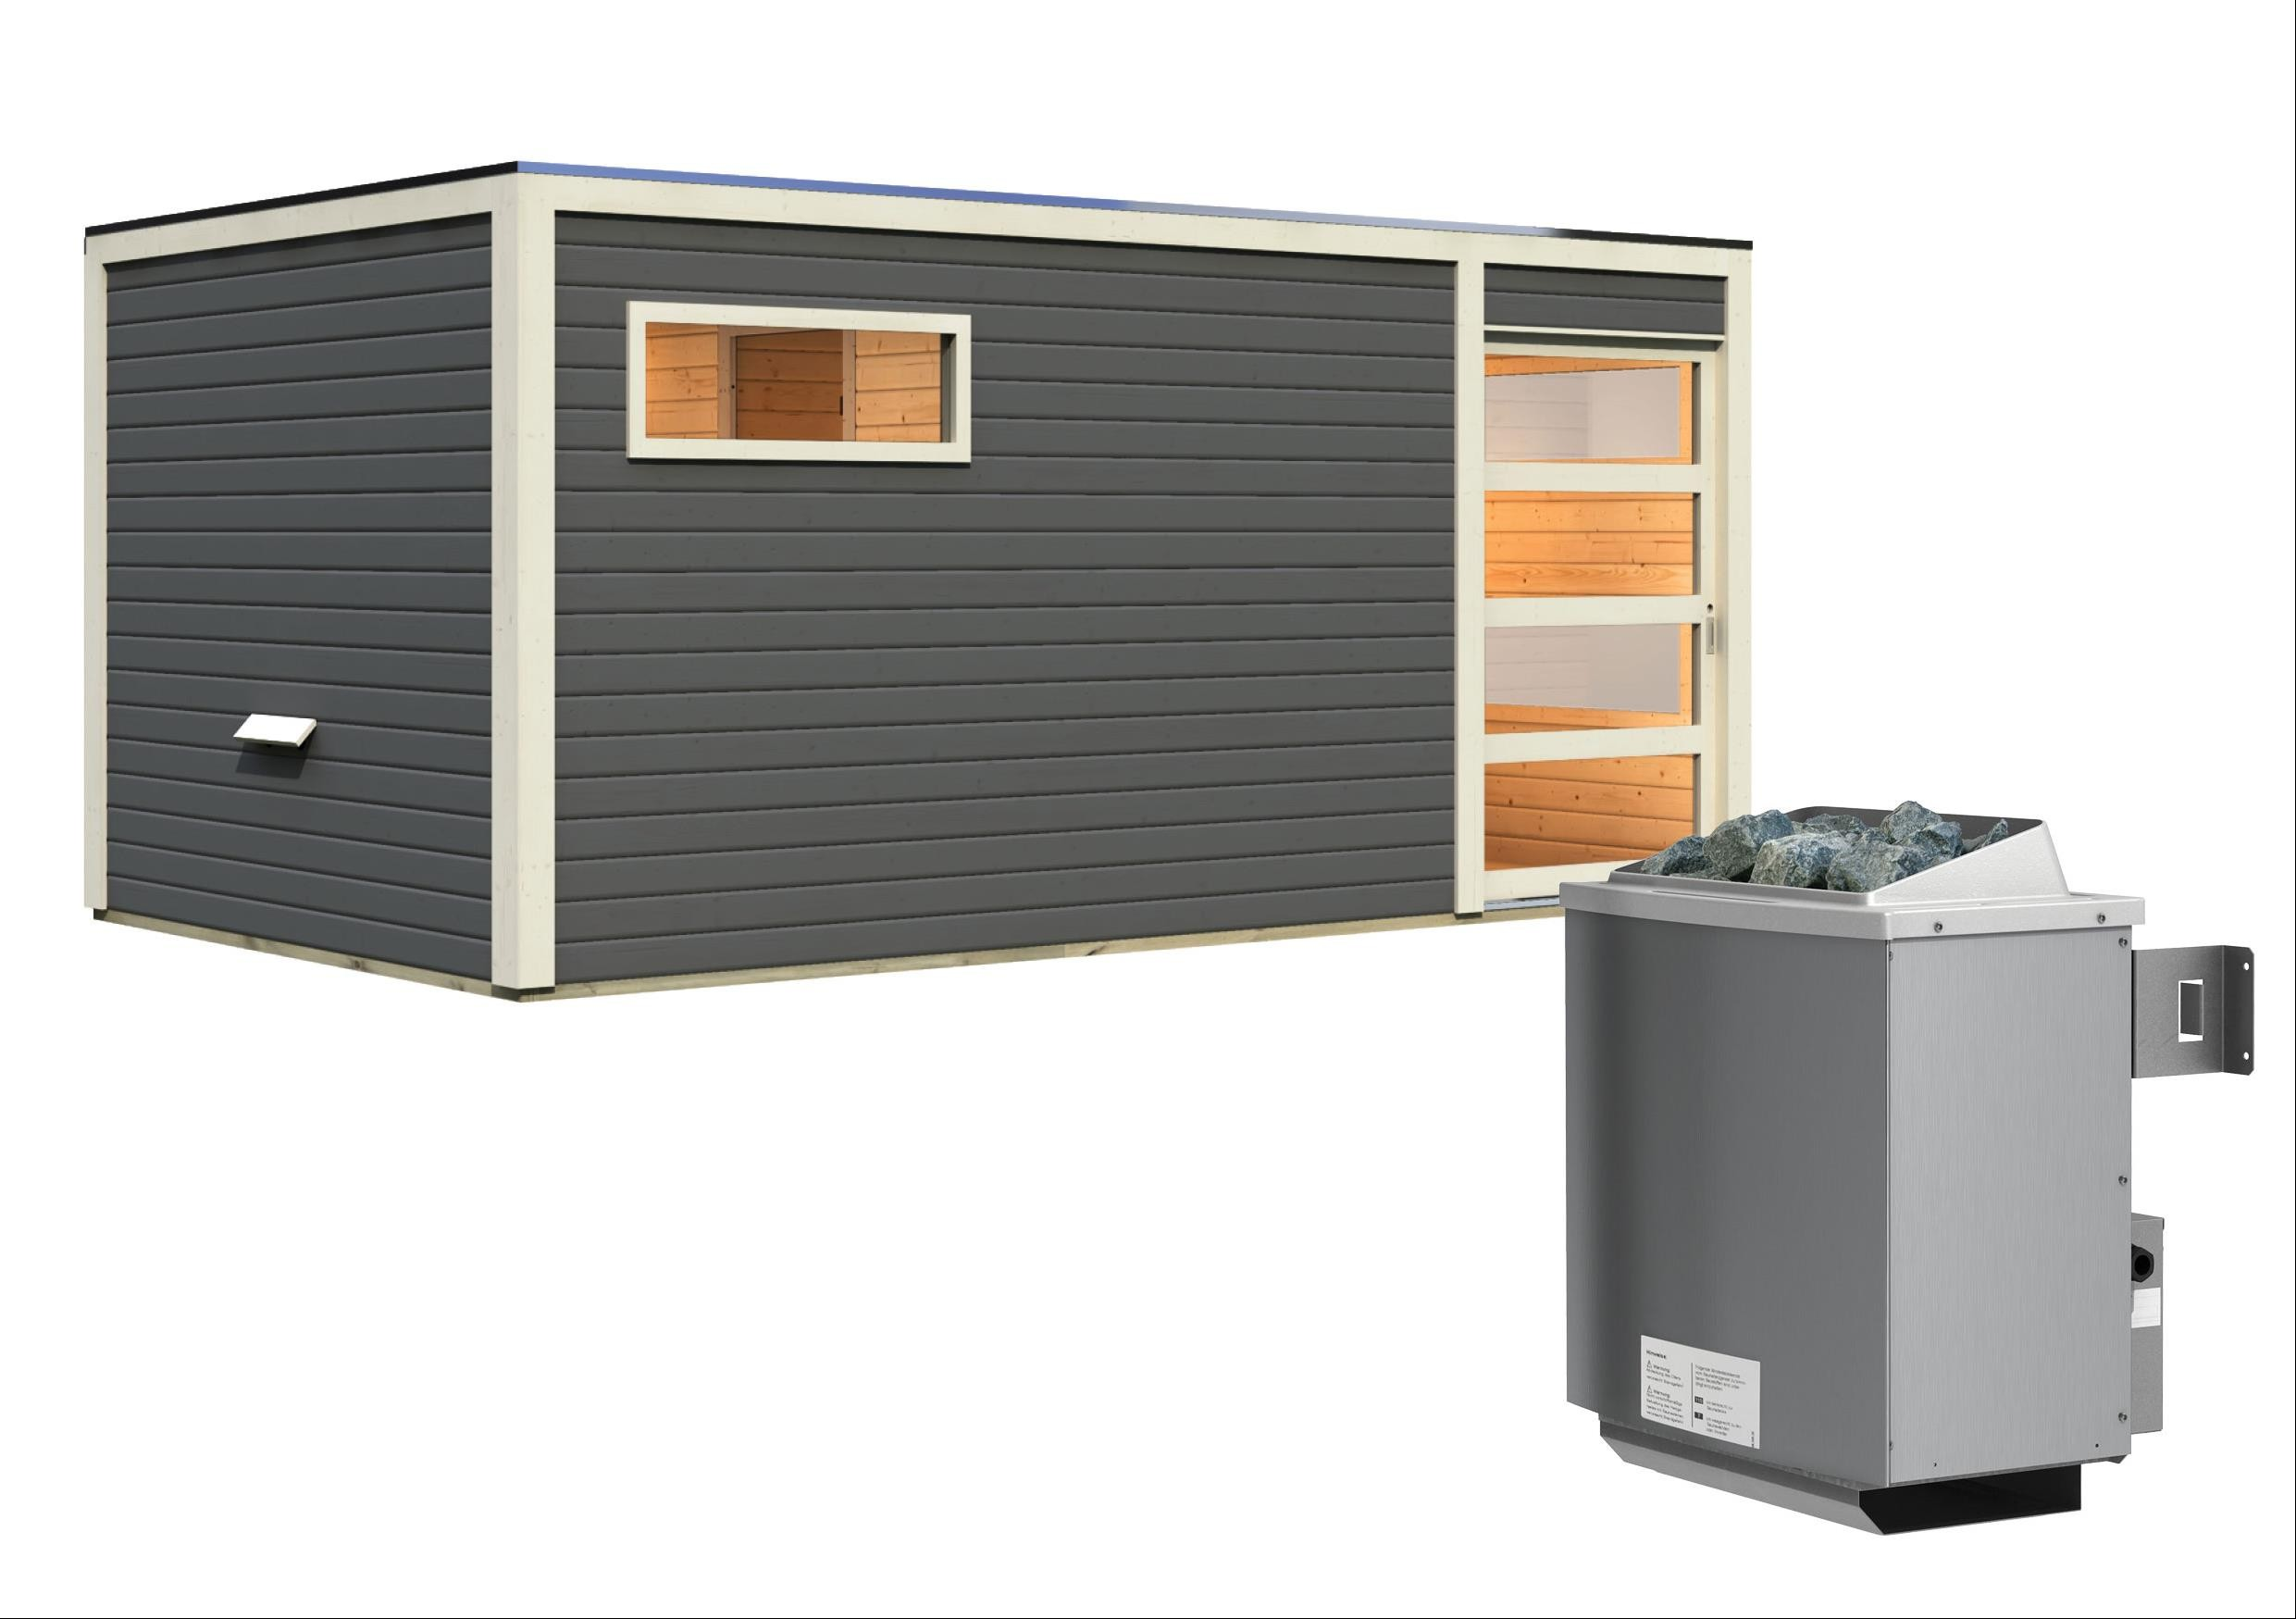 Gartensauna Karibu Saunahaus Hygge grau 38mm Saunaofen 9kW intern Bild 3